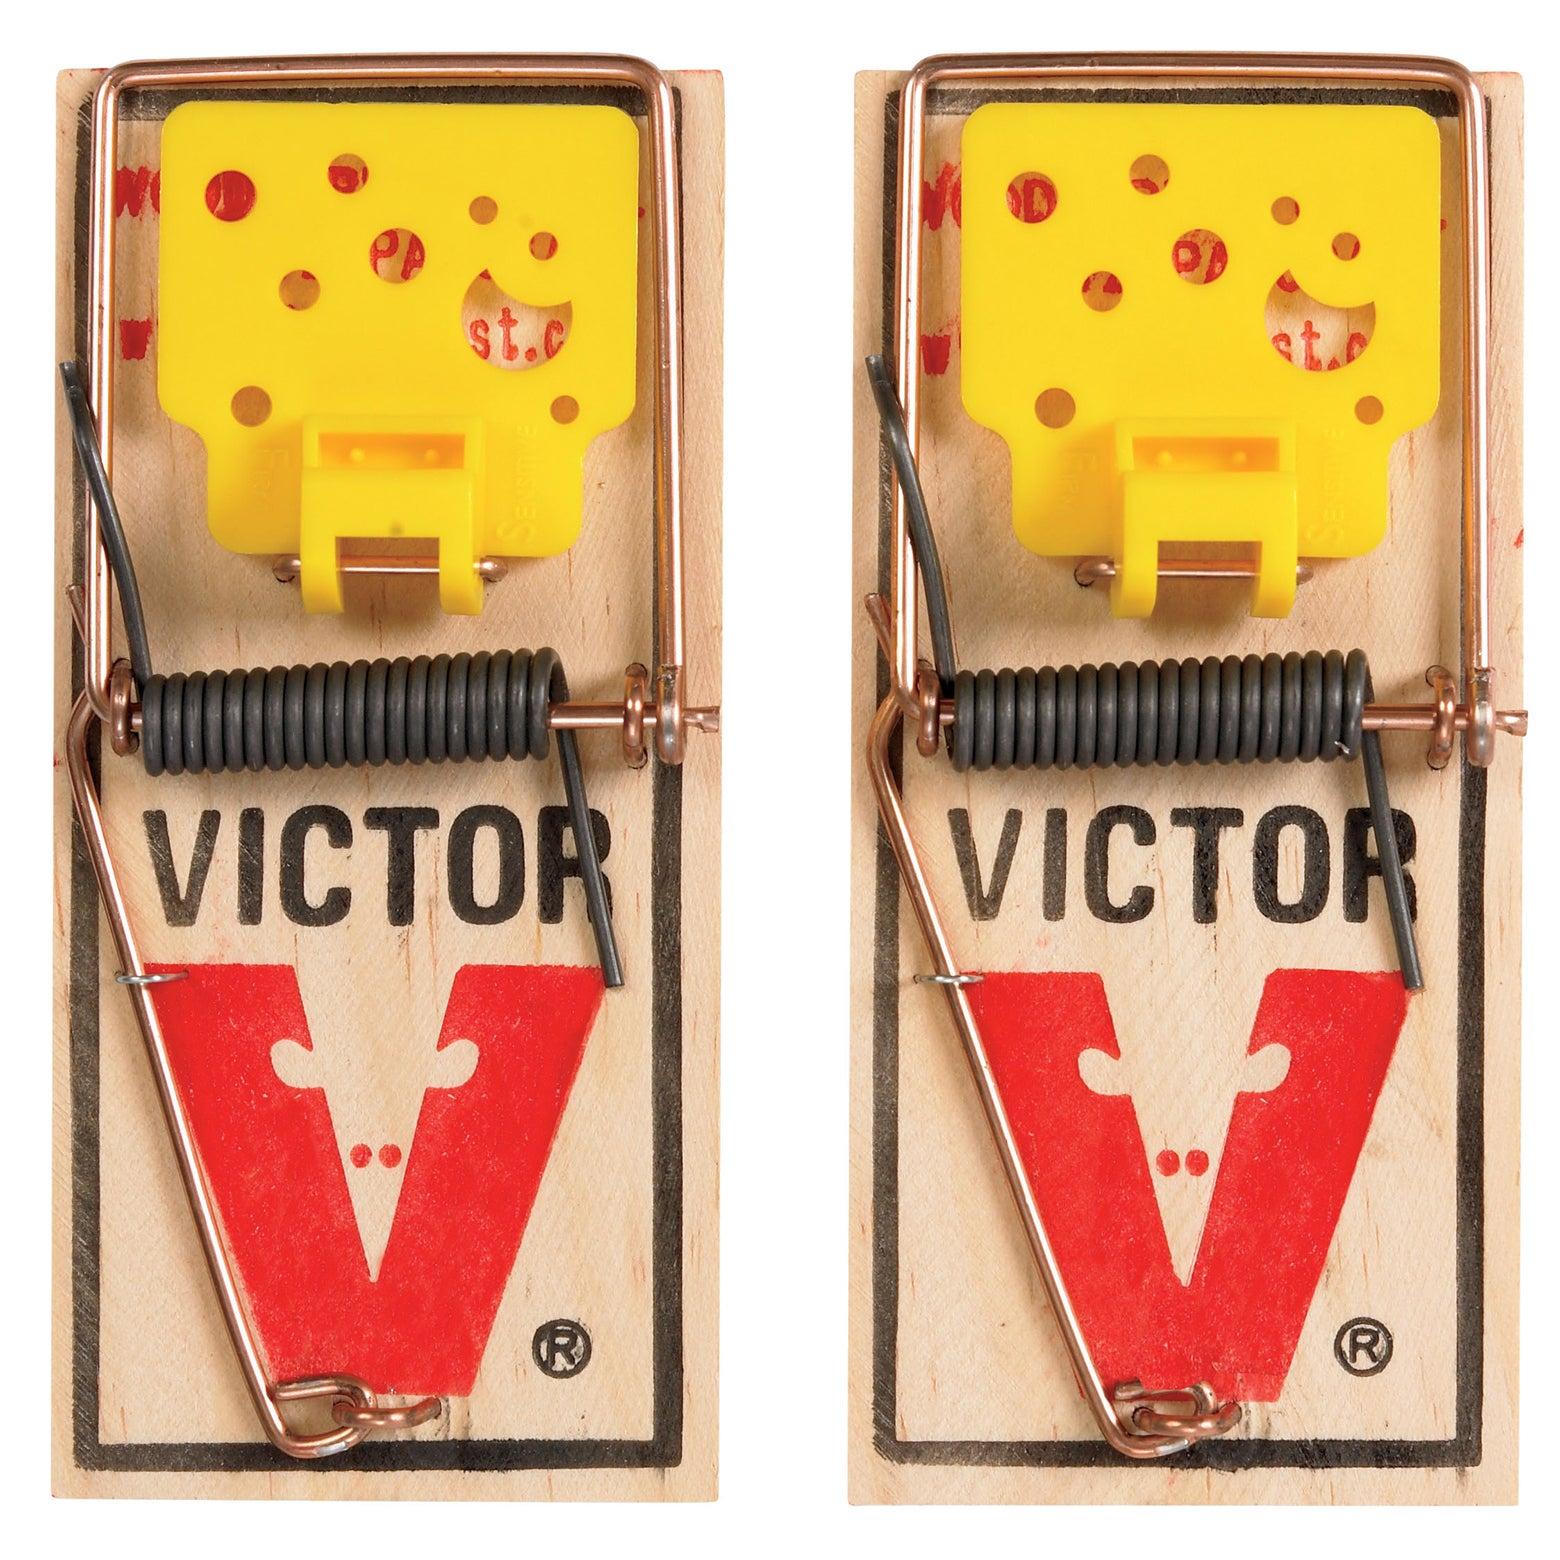 Jensen Victor M035 Easy Set Mouse Traps 2 Count (Trap Mou...